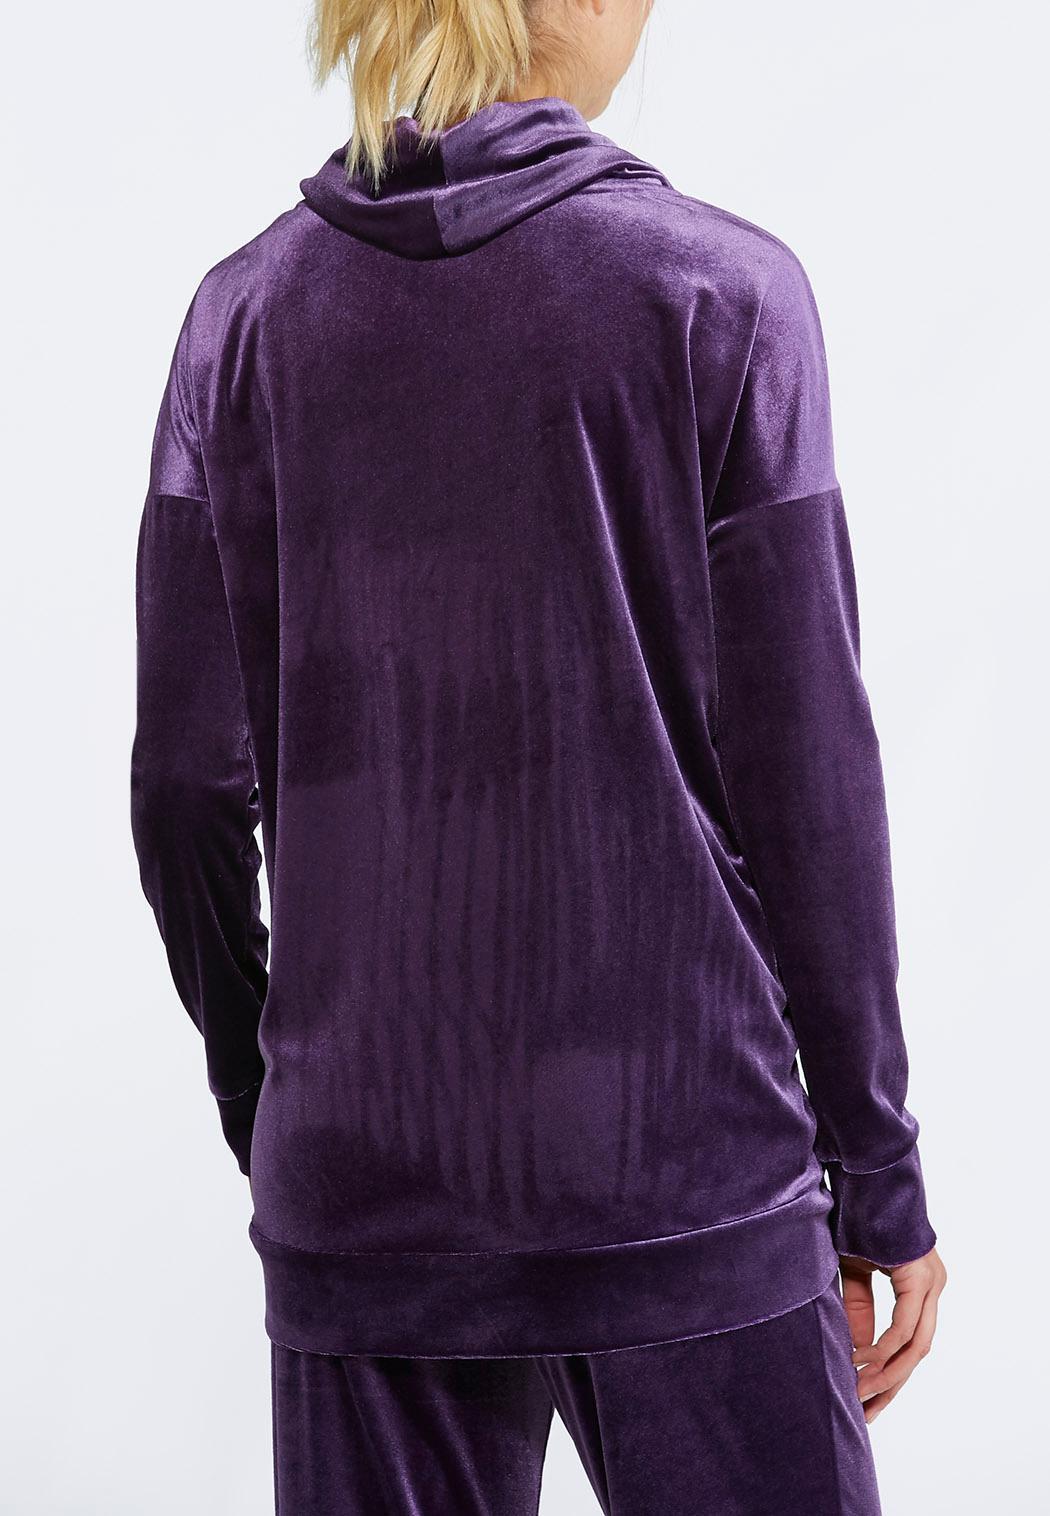 Velour cowl neck top tops cato fashions